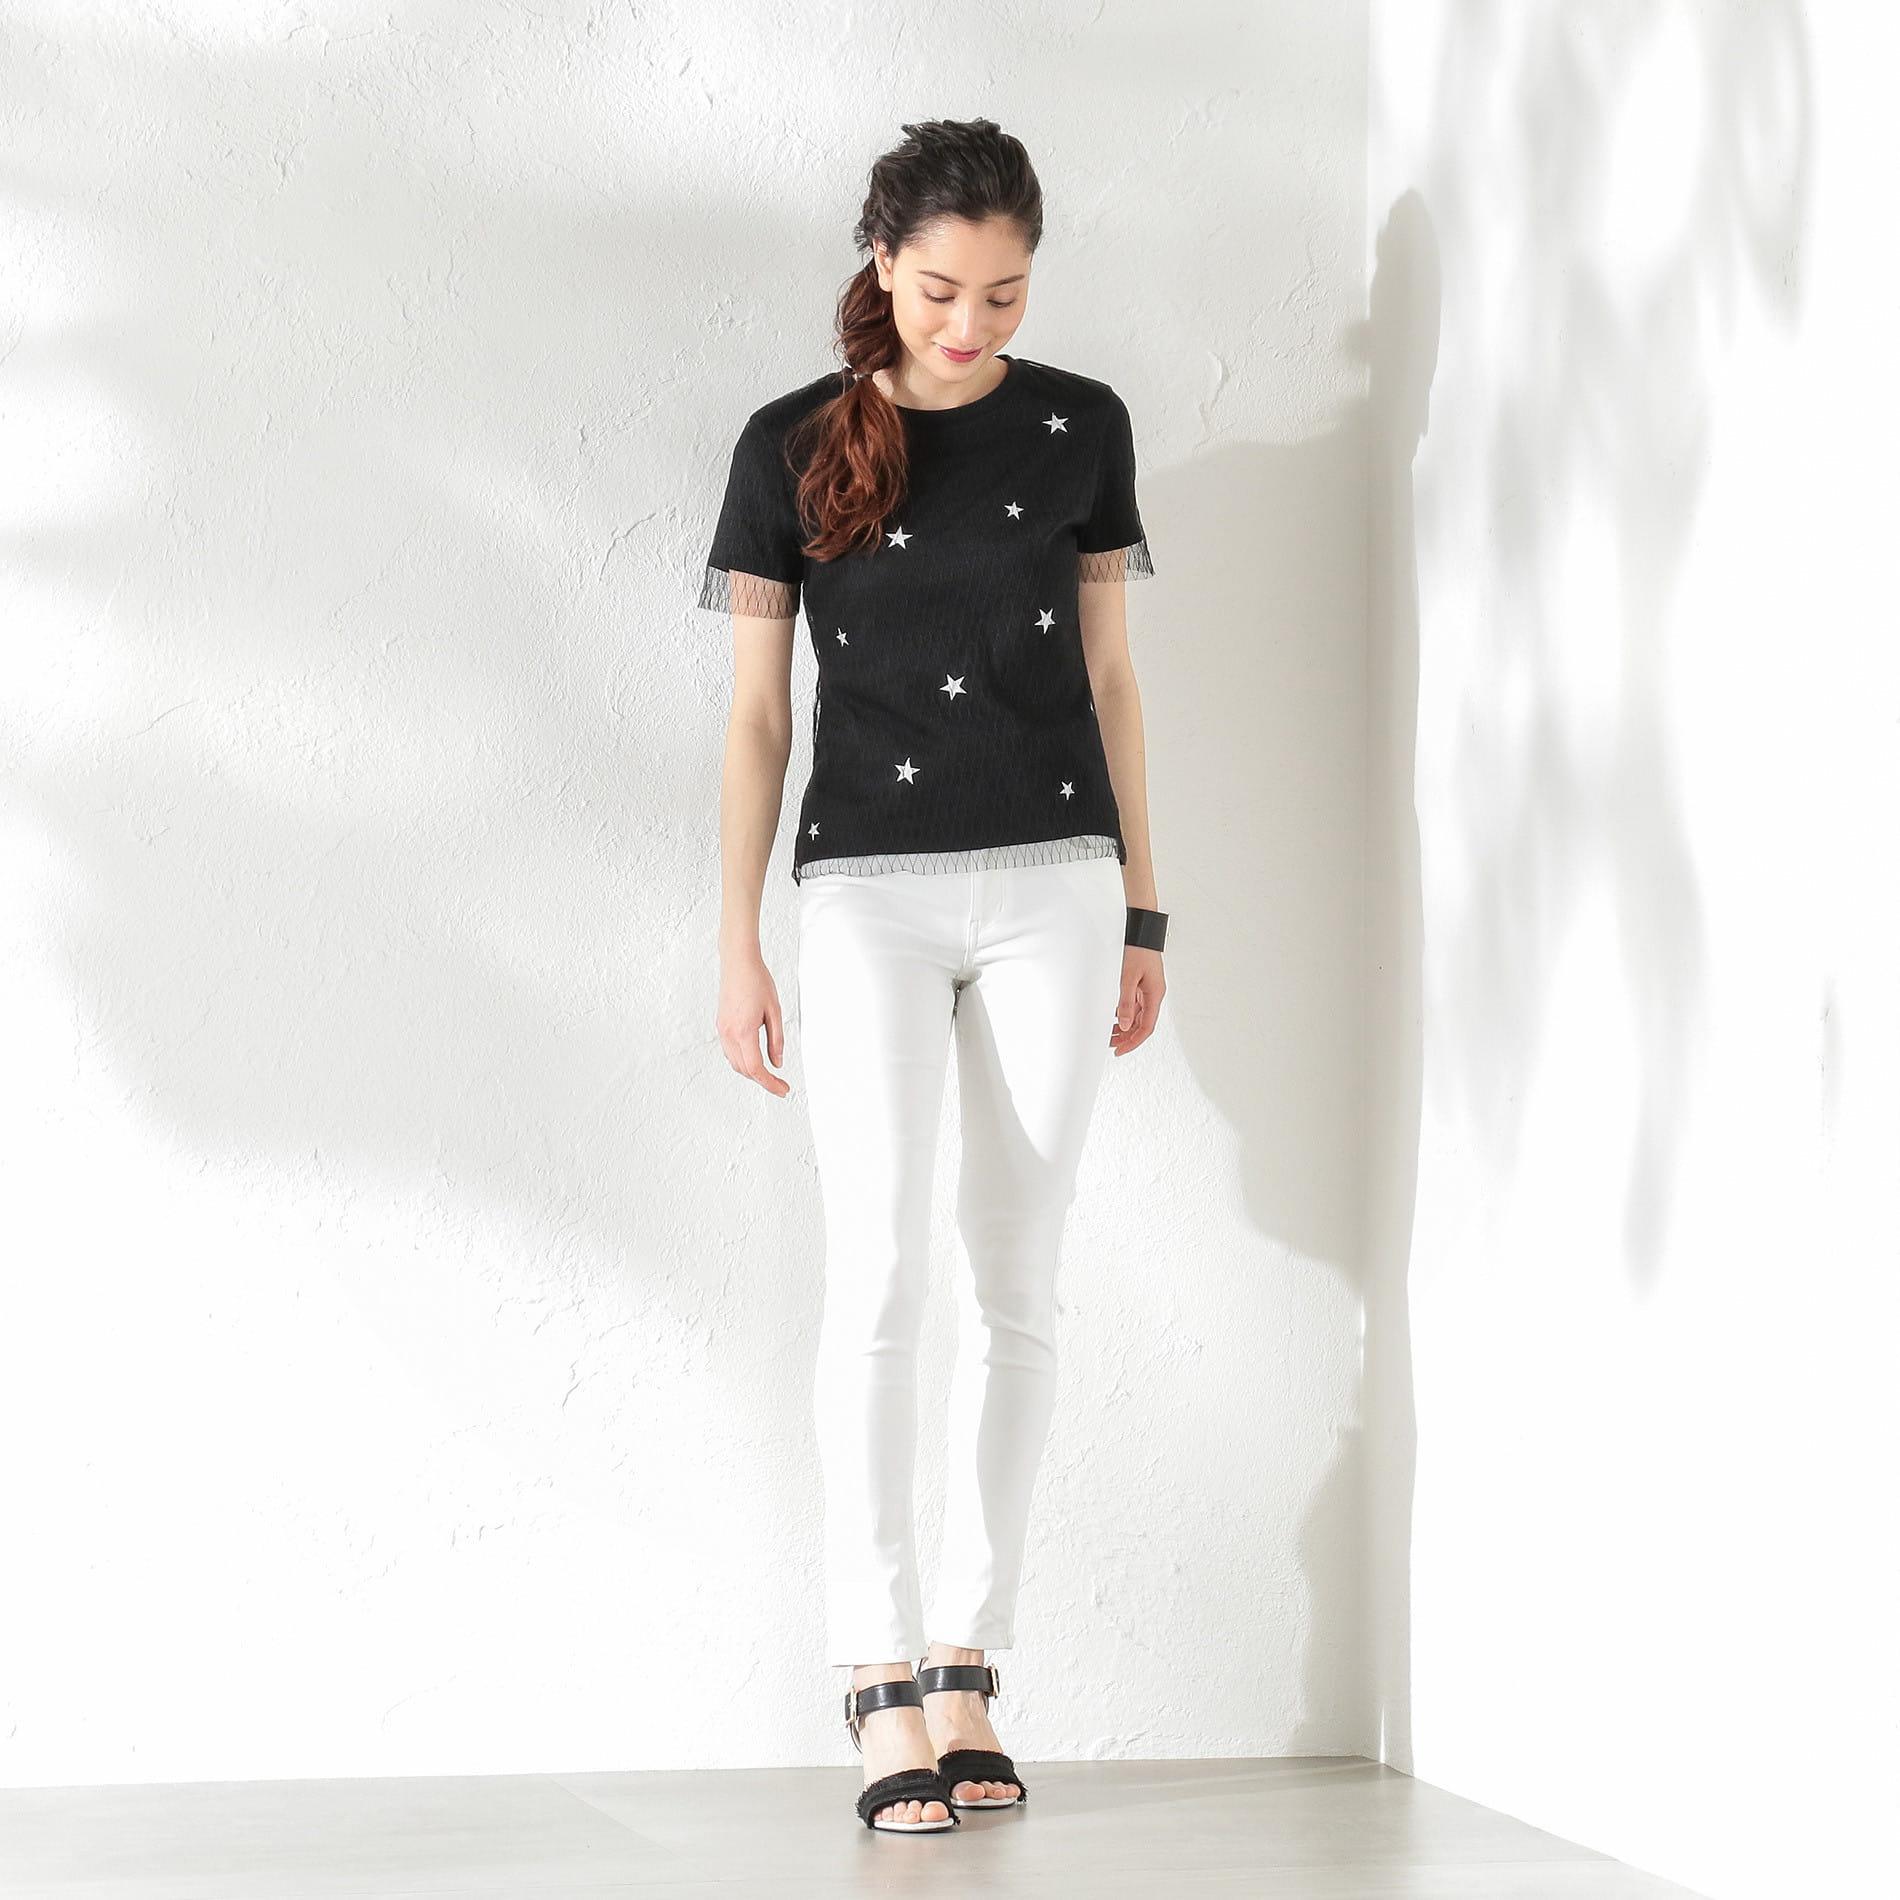 【GUILD PRIME】WOMEN スターチュールレイヤードTシャツ